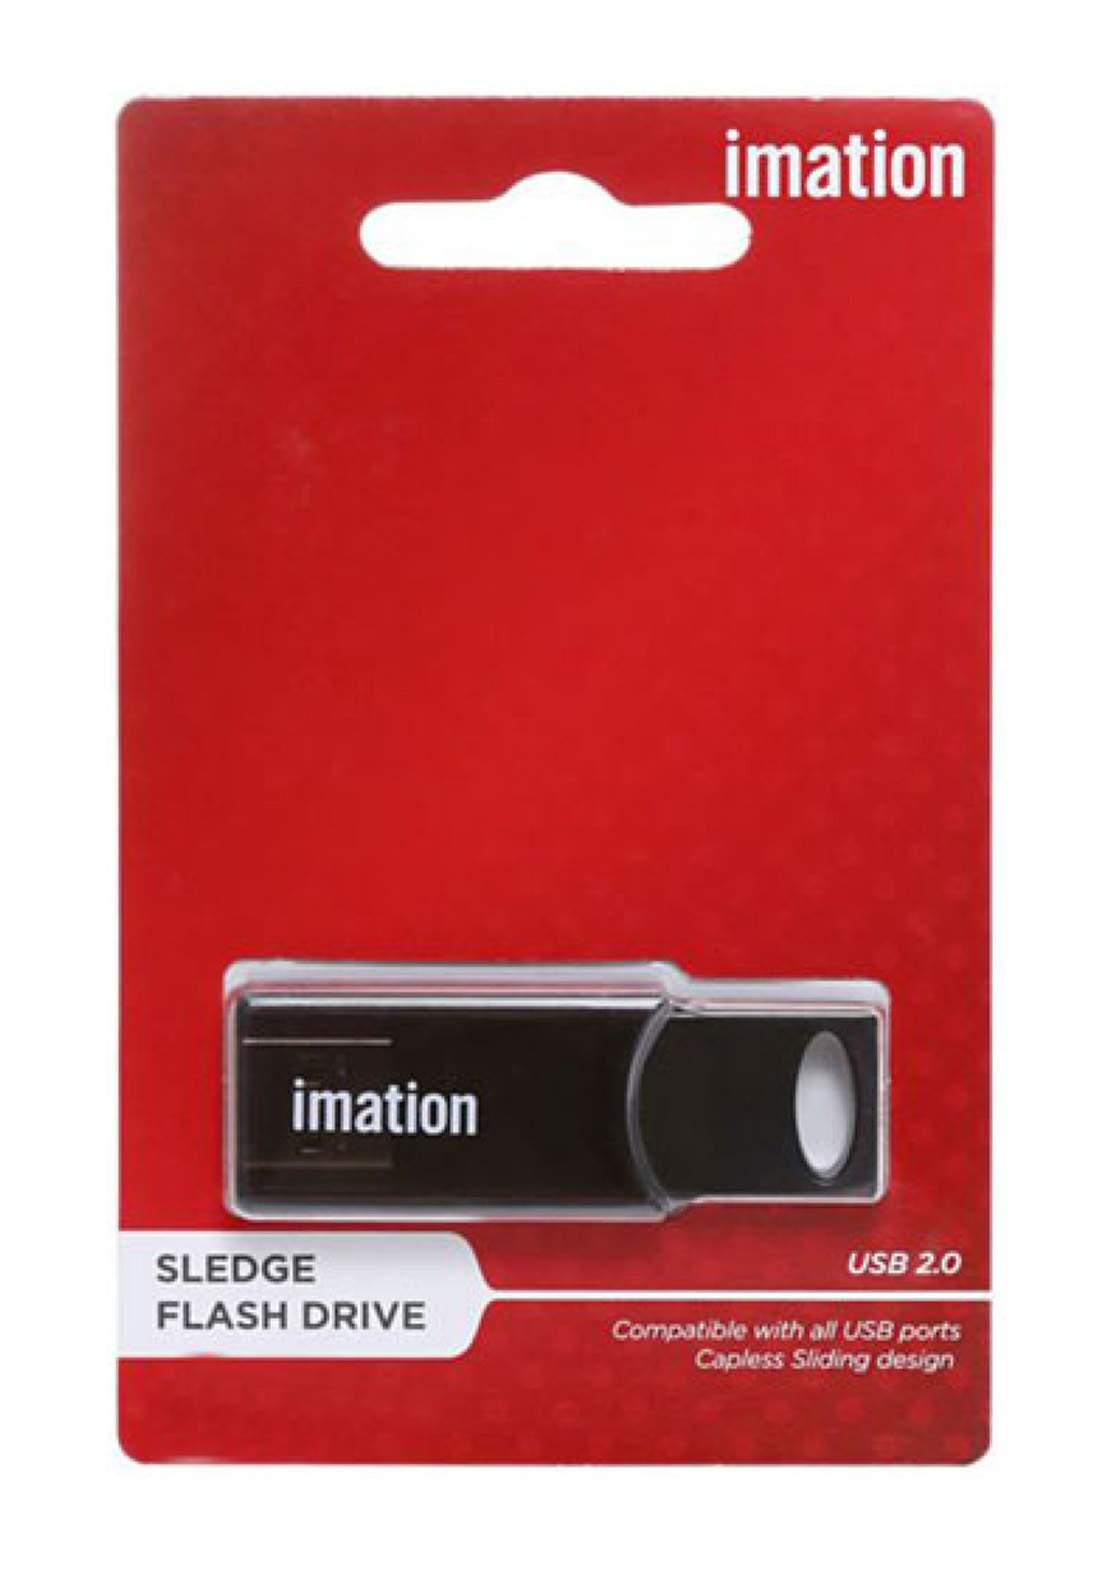 Imation Sledge USB 2.0 Flash Drive 8 GB فلاش